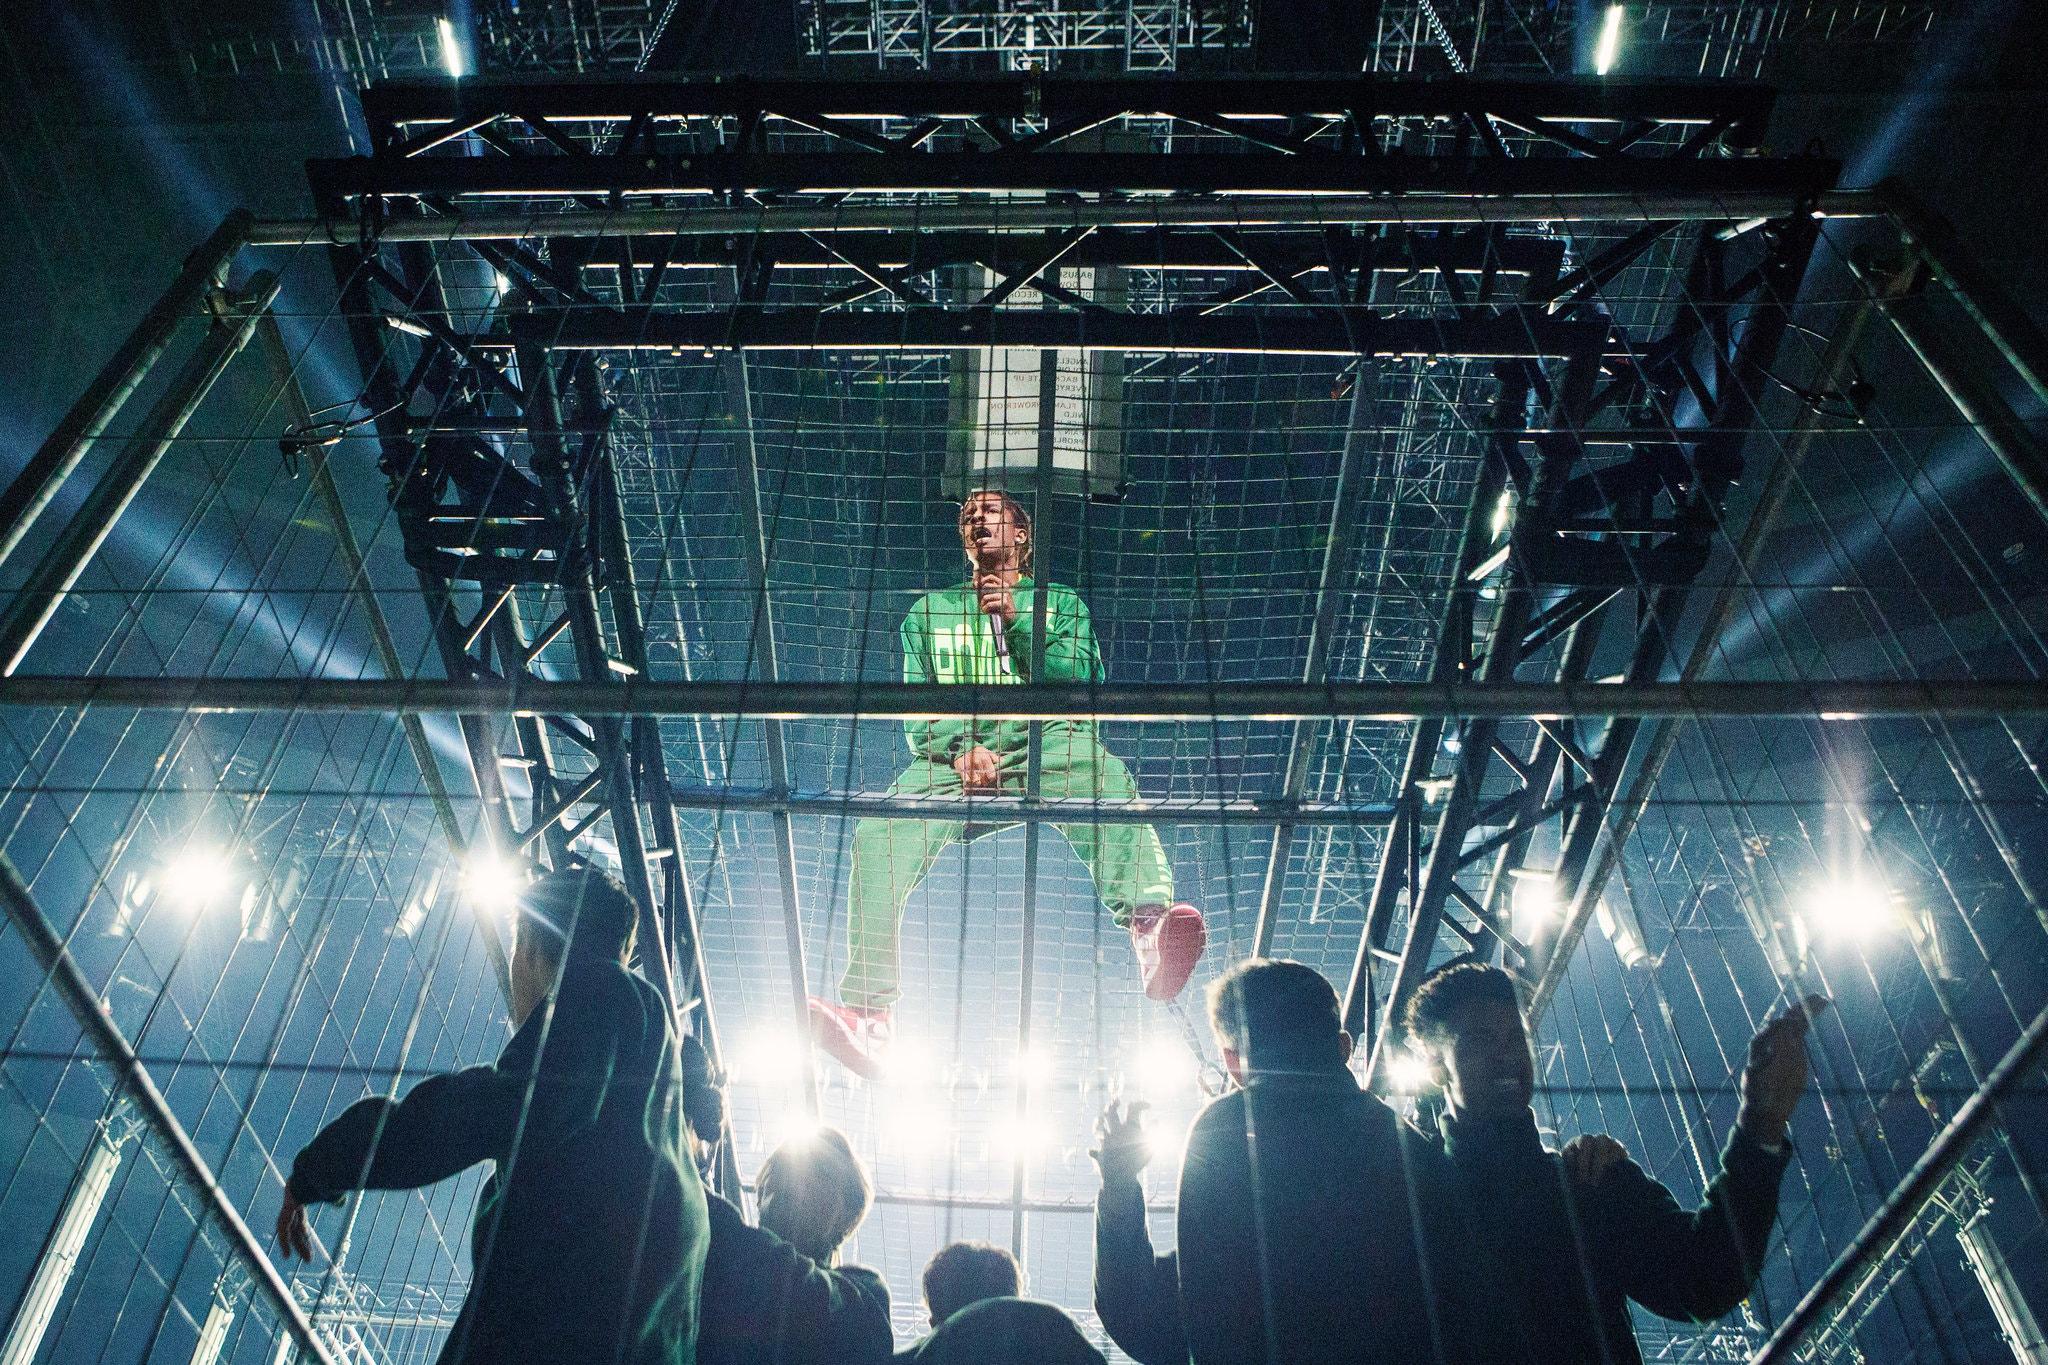 A$AP Rocky volvió a Suecia e hizo un show metido en una jaula gigante